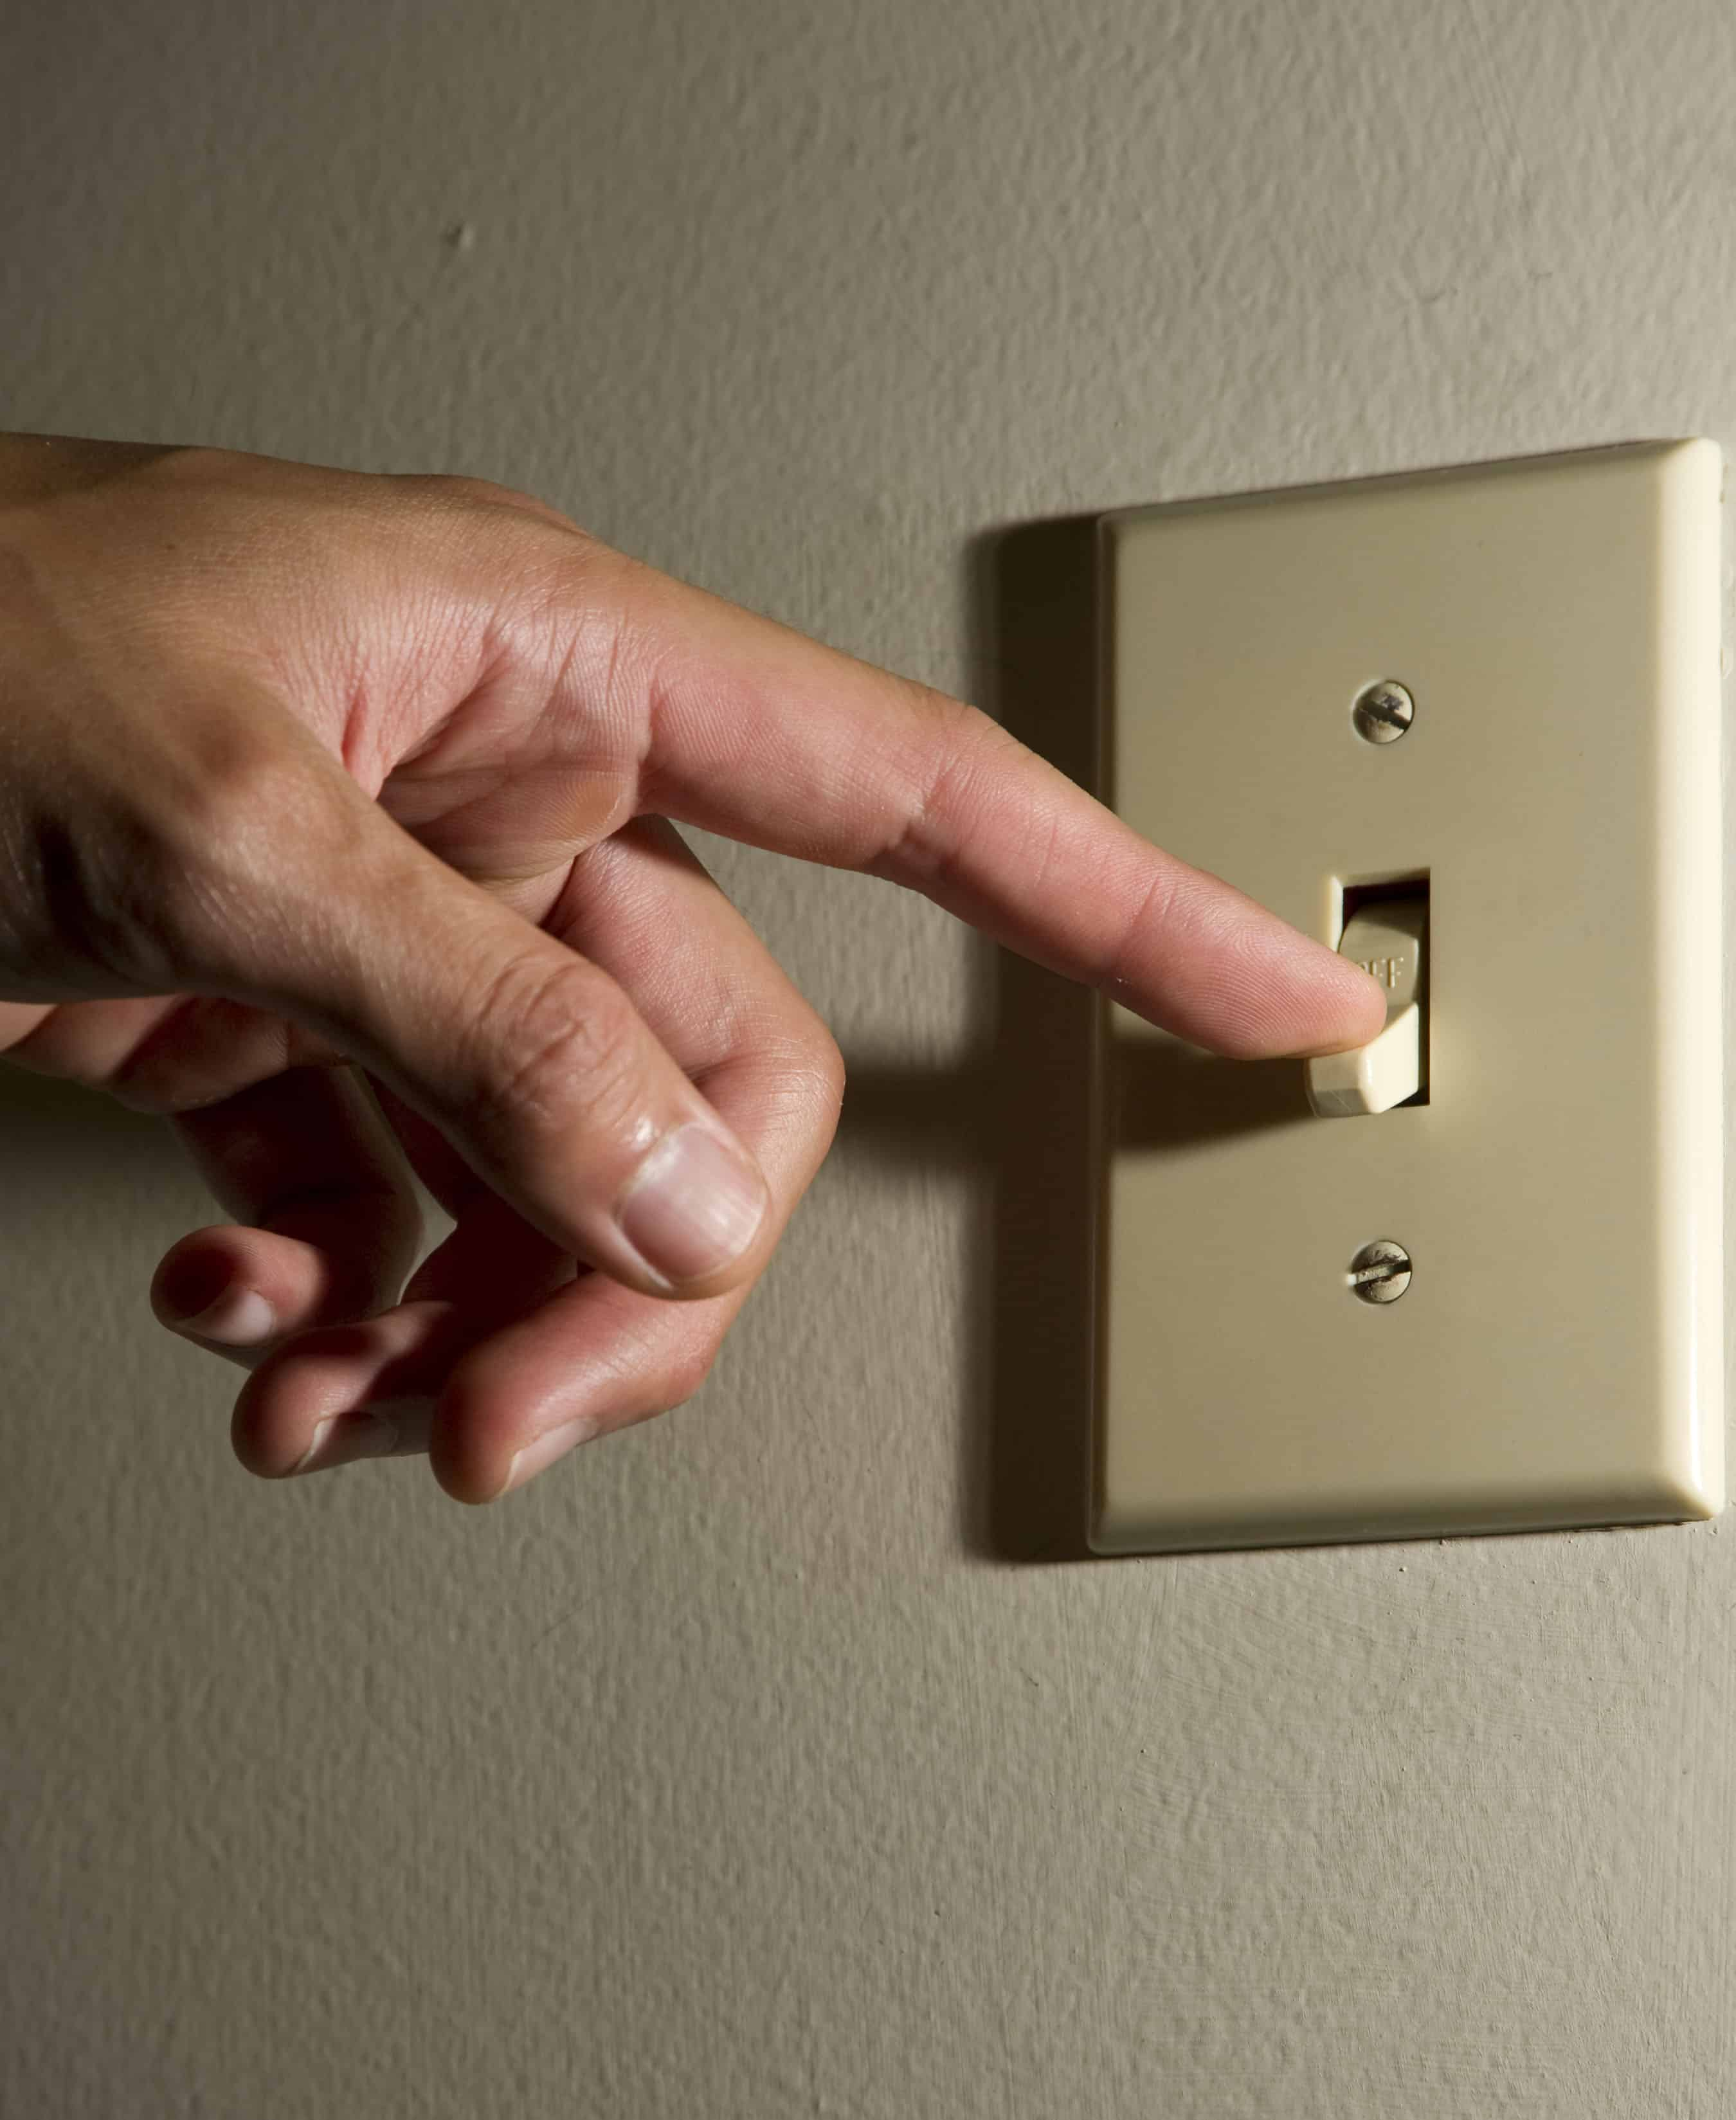 Brilliant Warm Light Switch What Does It Mean Applewood Plumbing Wiring 101 Hemtstreekradiomeanderfmnl